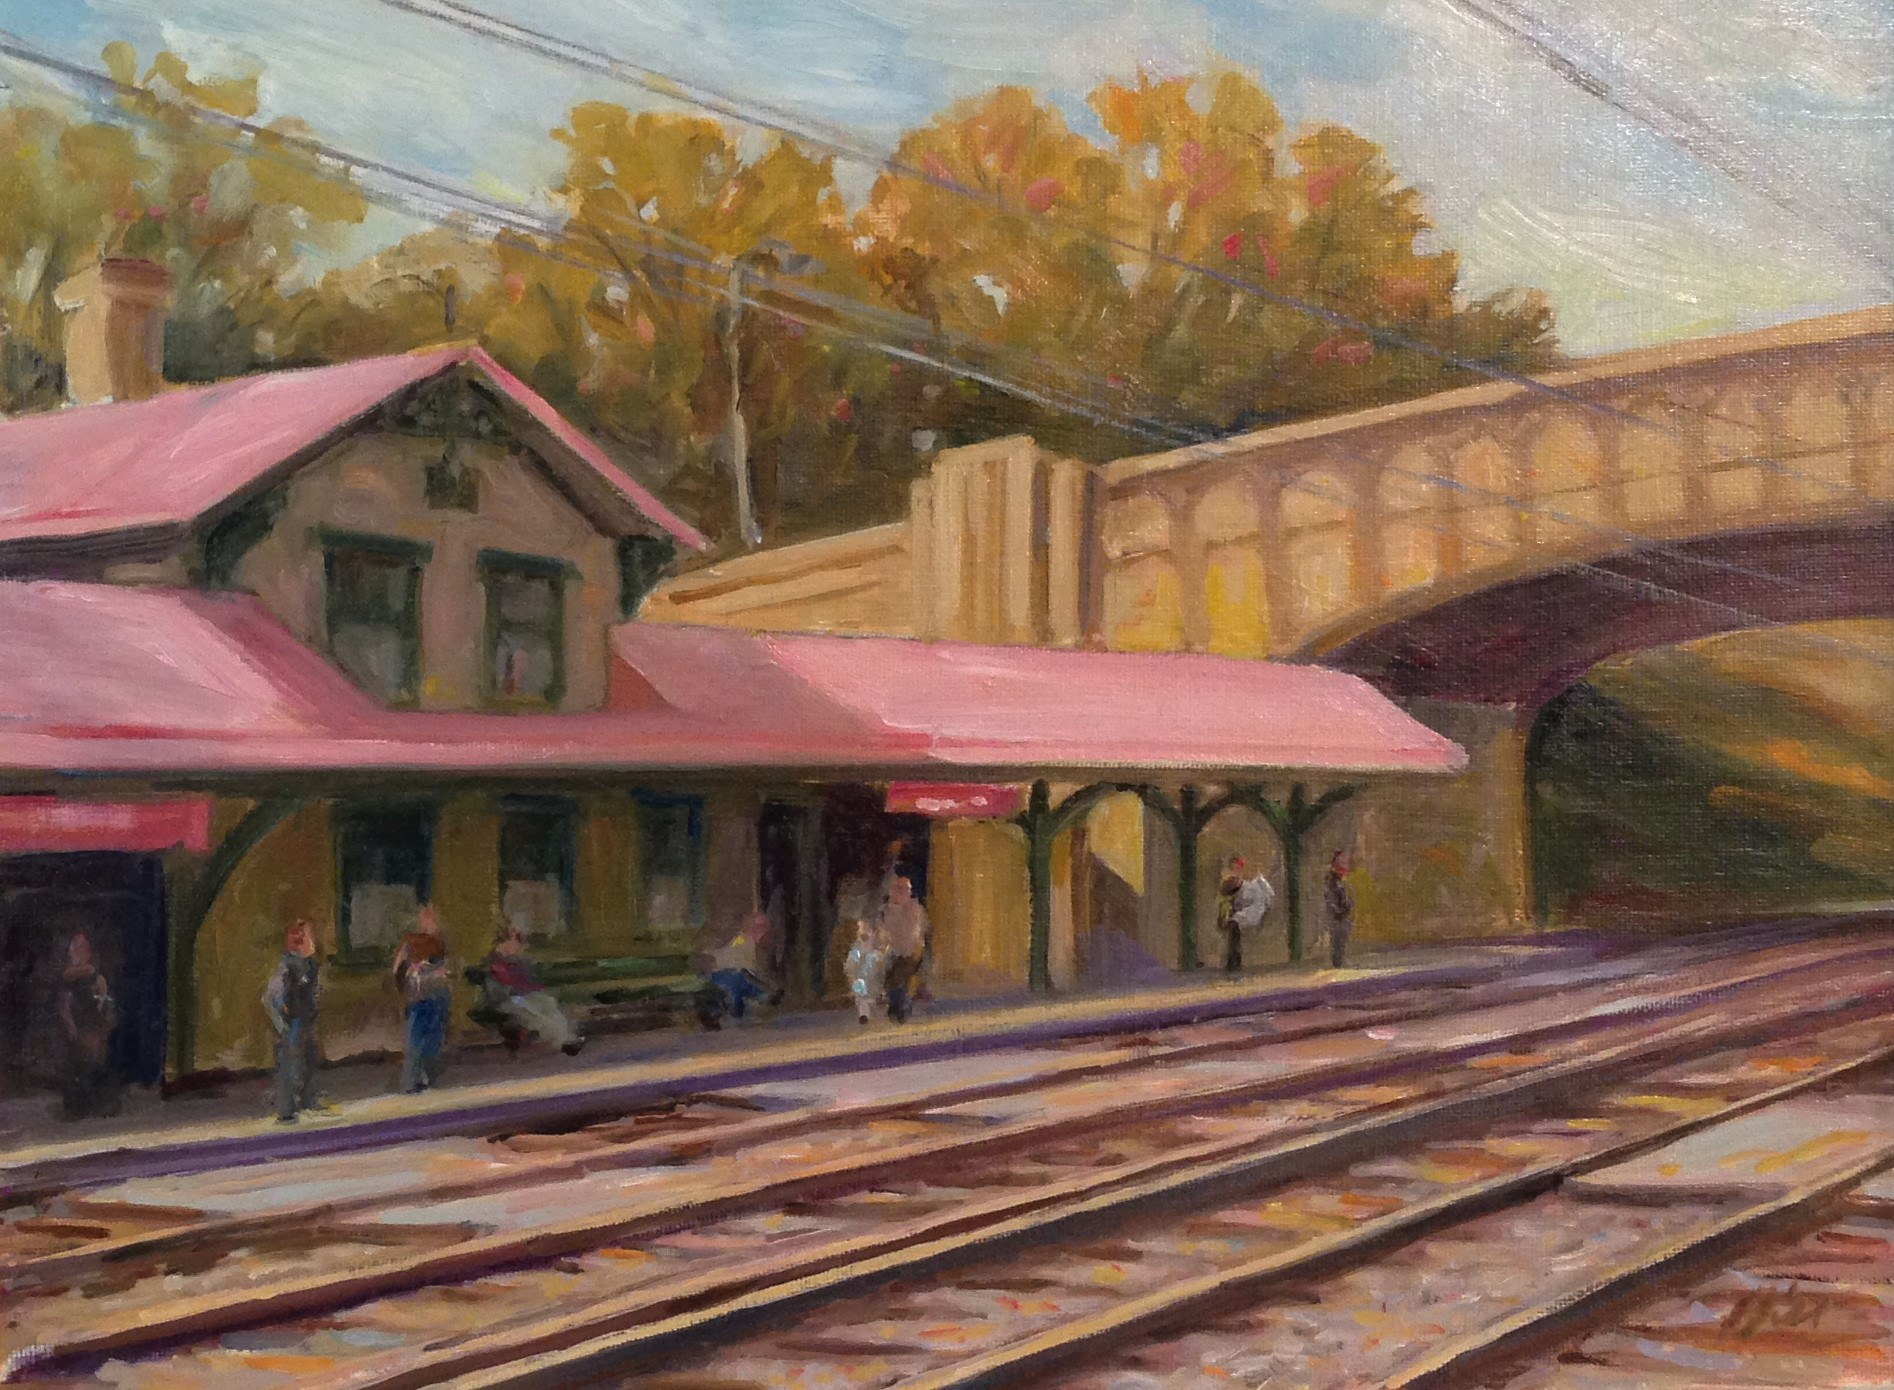 Overbrook Station